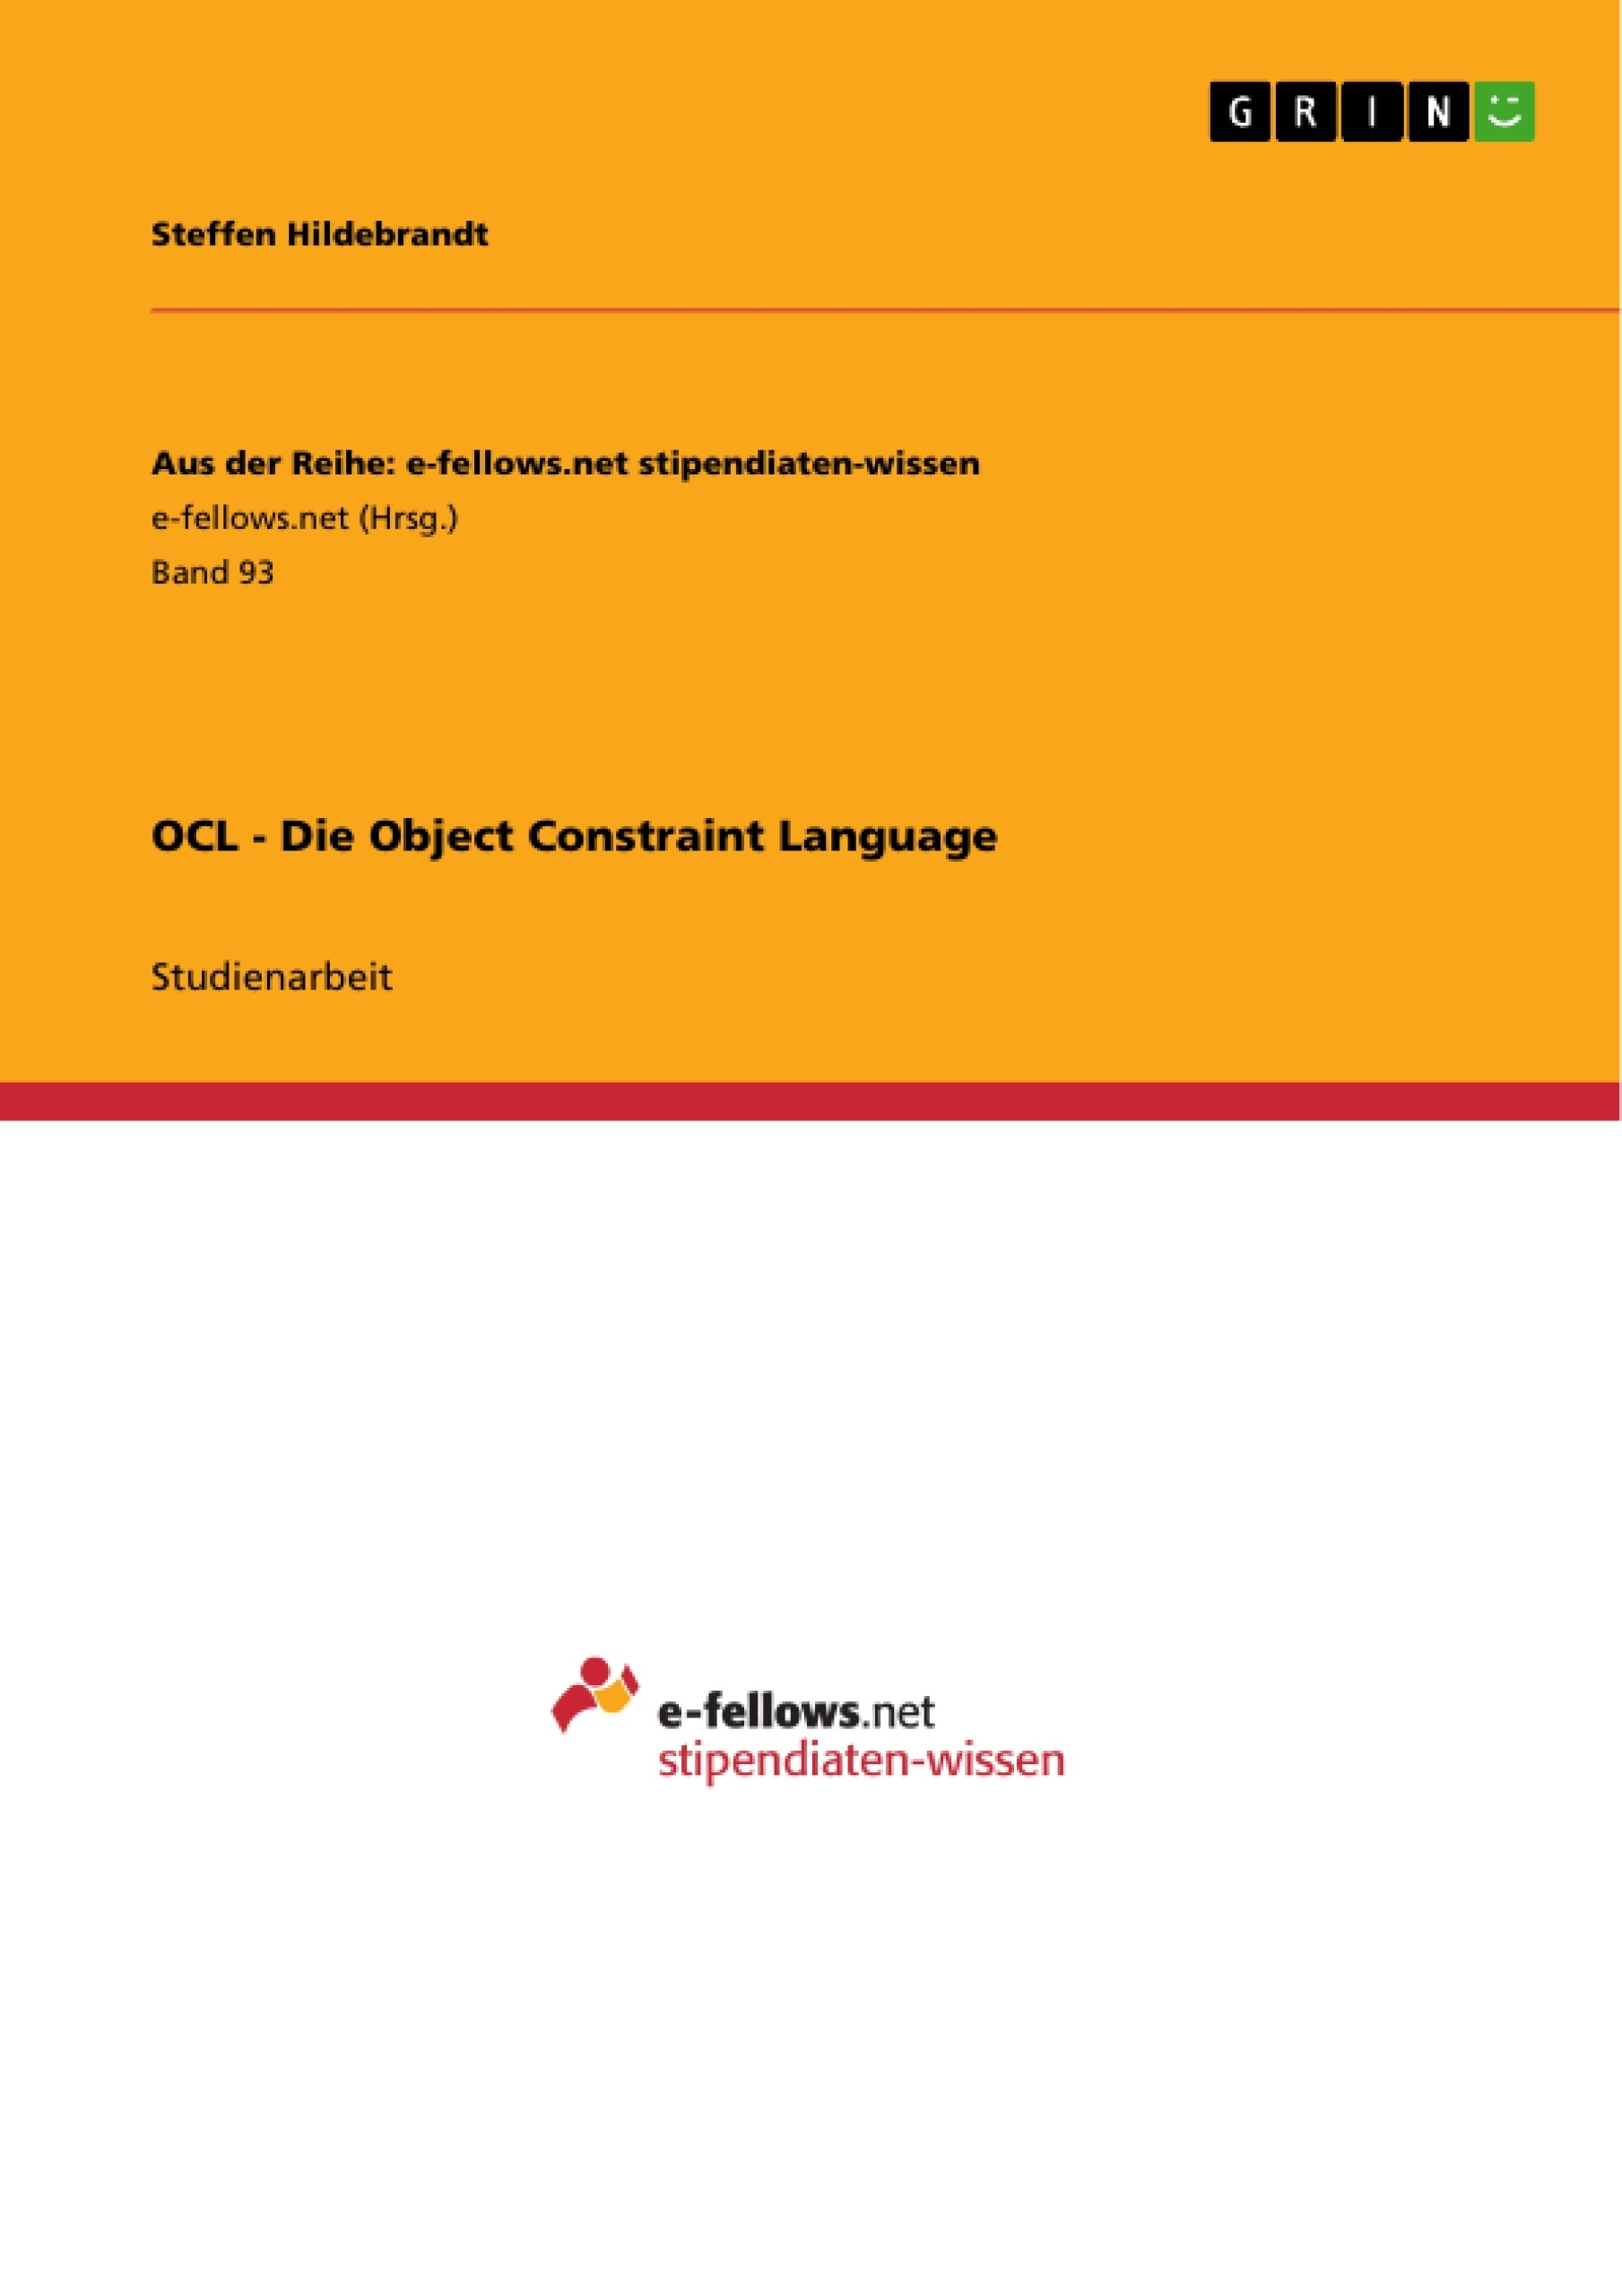 Titel: OCL - Die Object Constraint Language